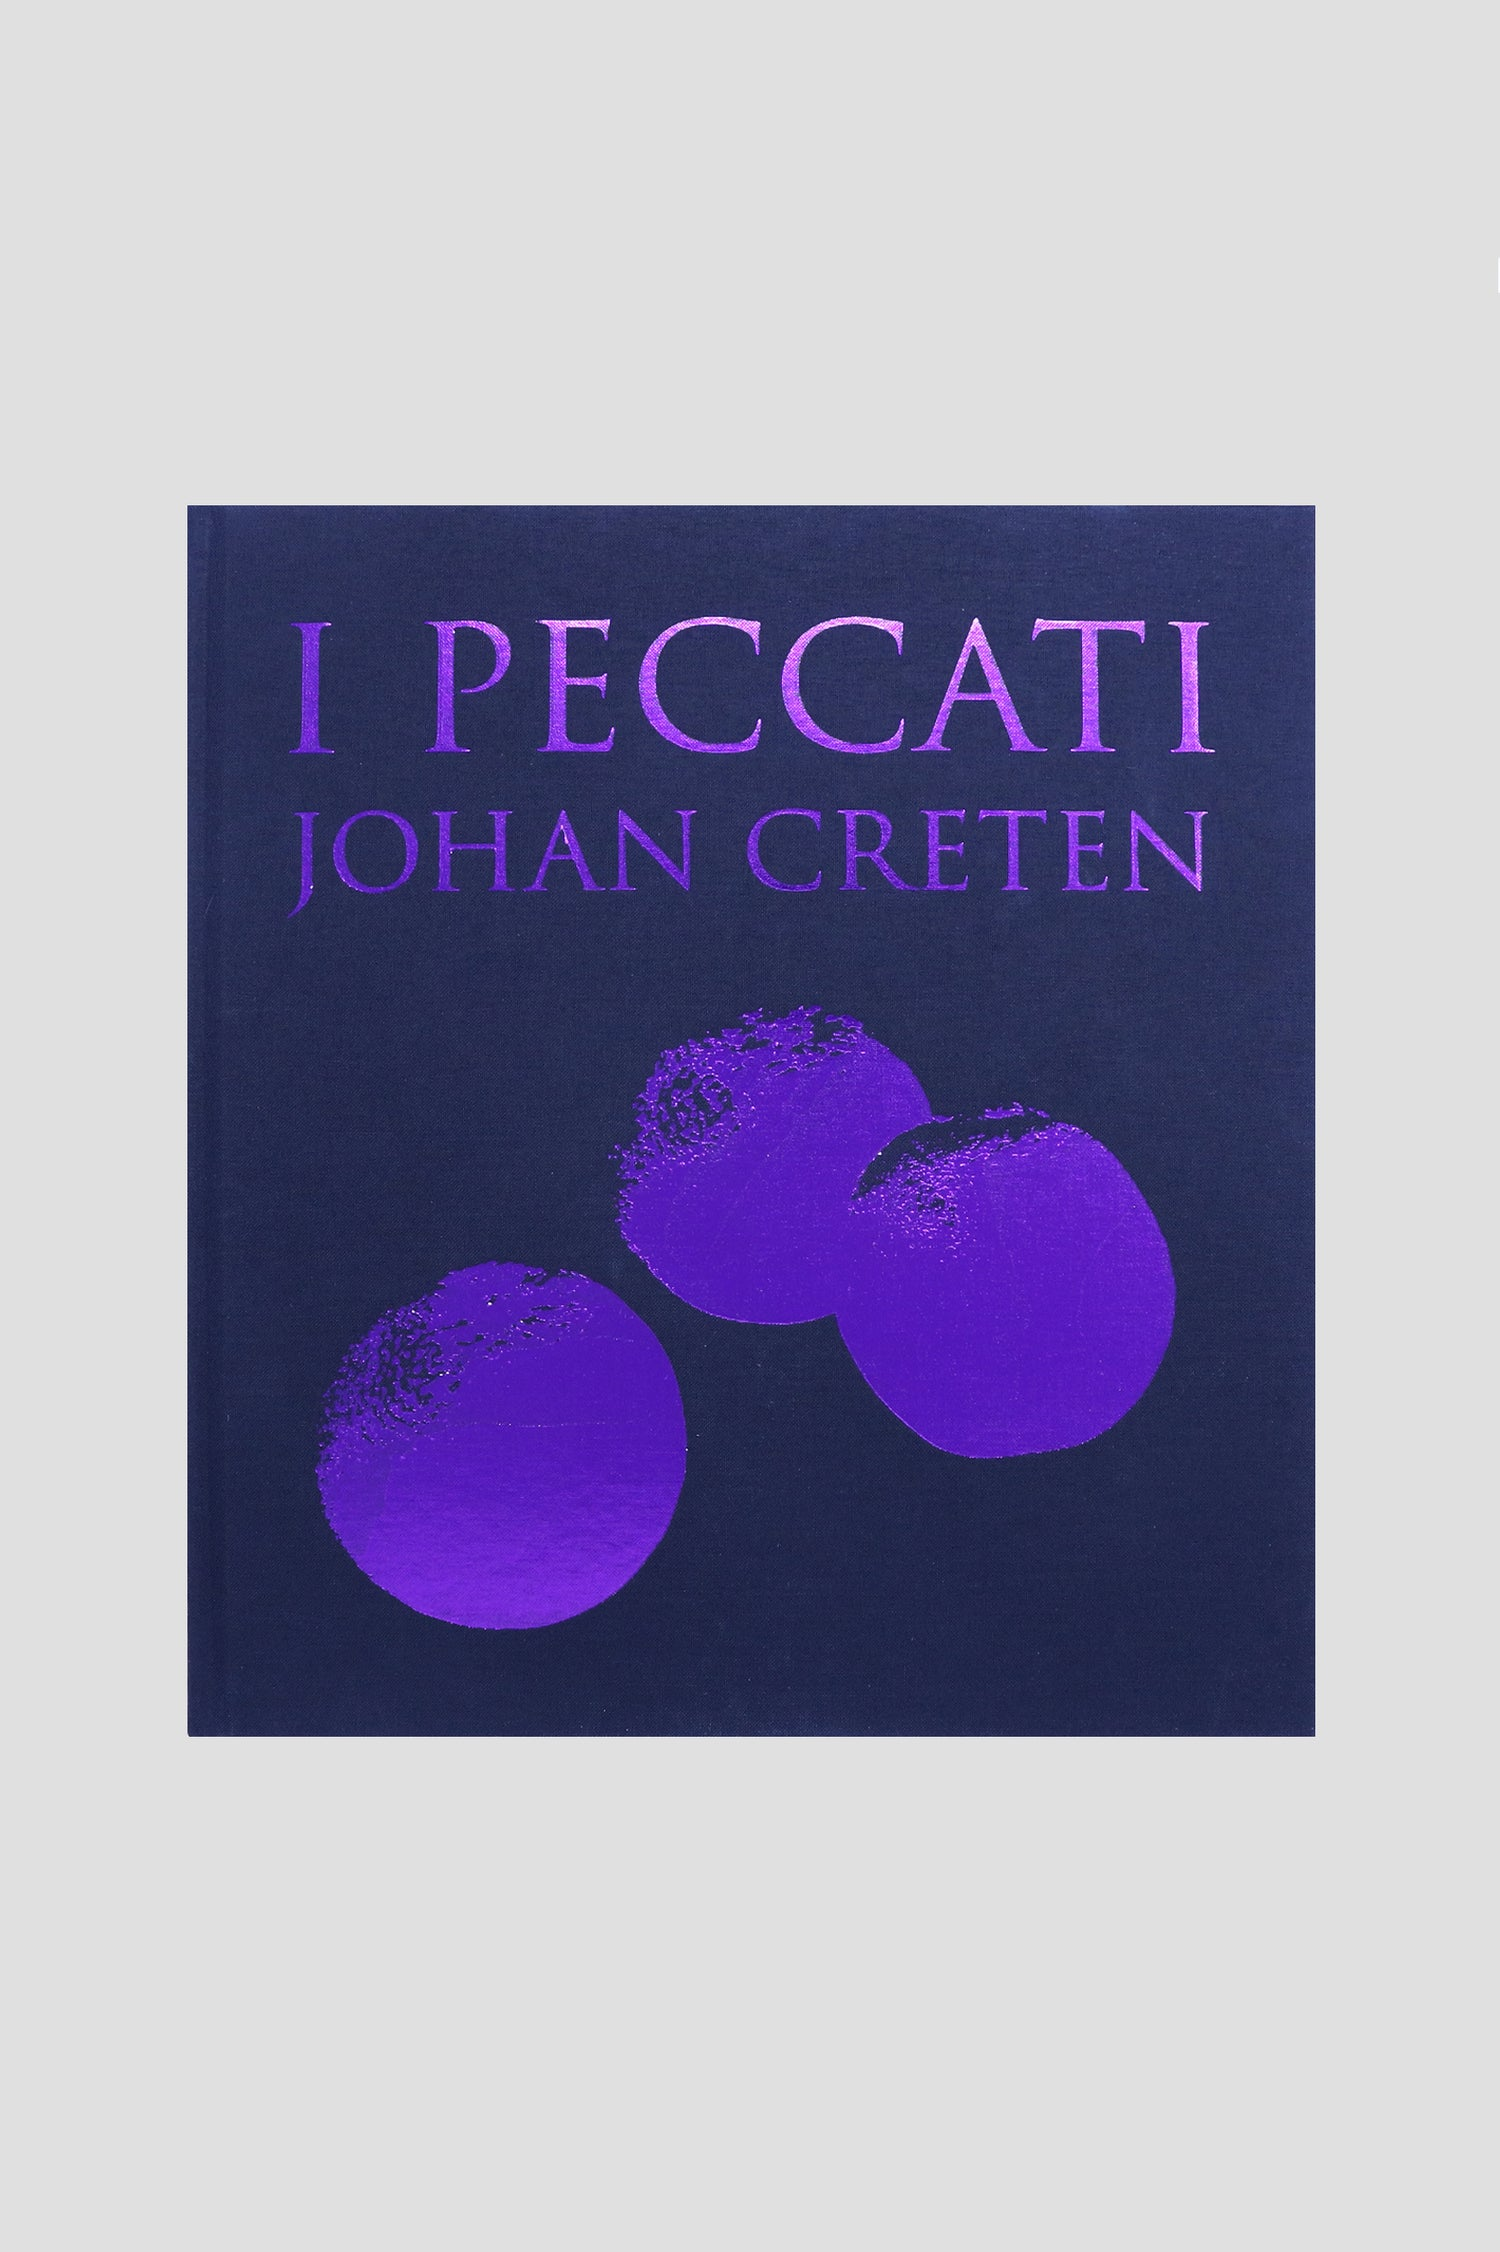 Image of Johan Creten - I Peccati